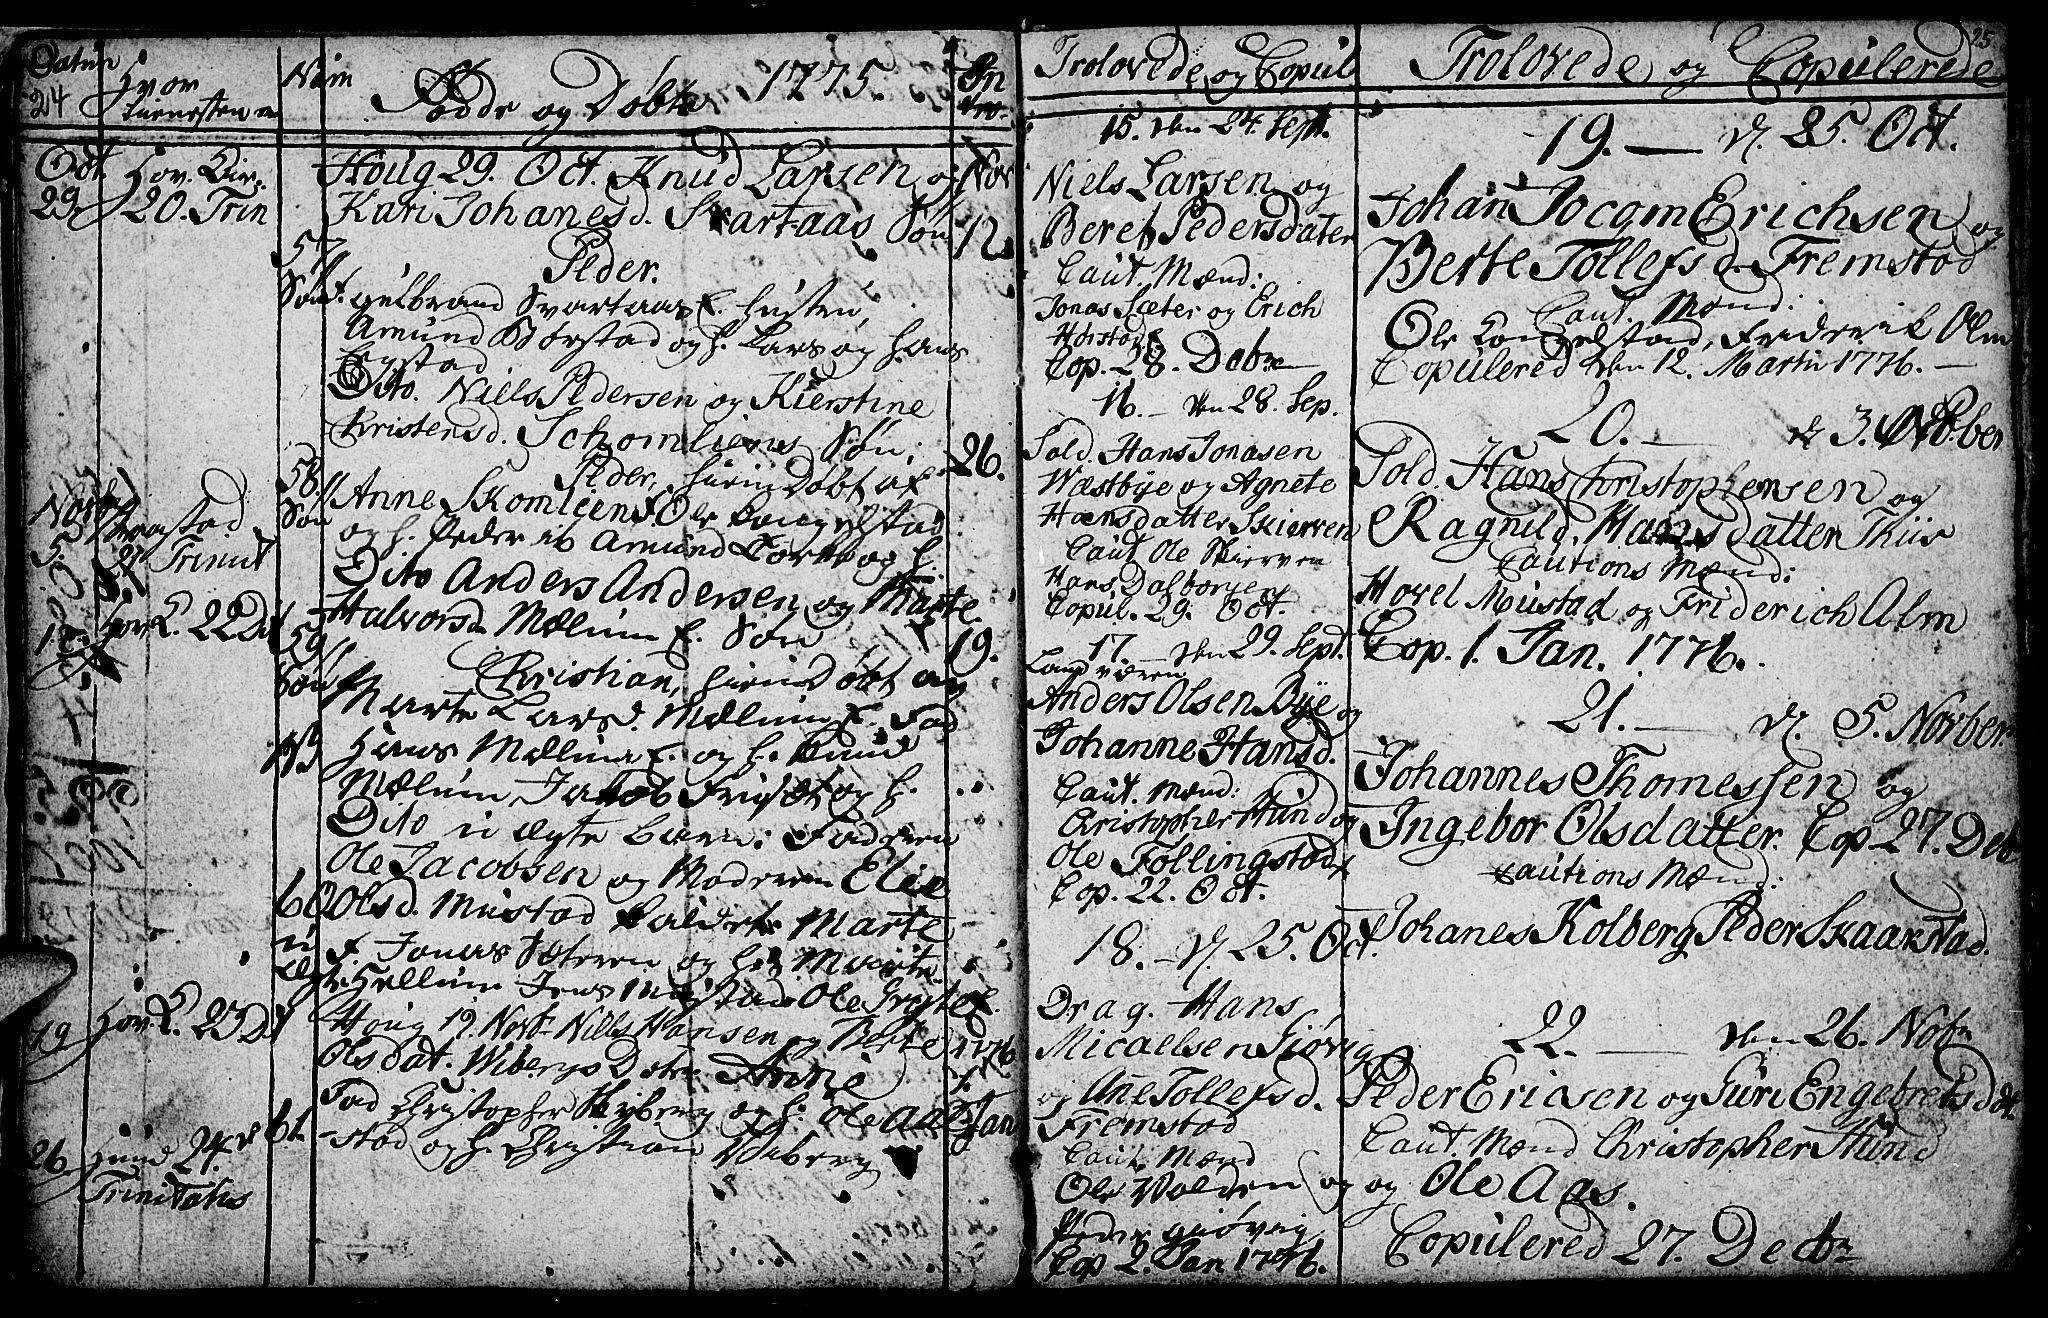 SAH, Vardal prestekontor, H/Ha/Hab/L0001: Klokkerbok nr. 1, 1771-1790, s. 24-25